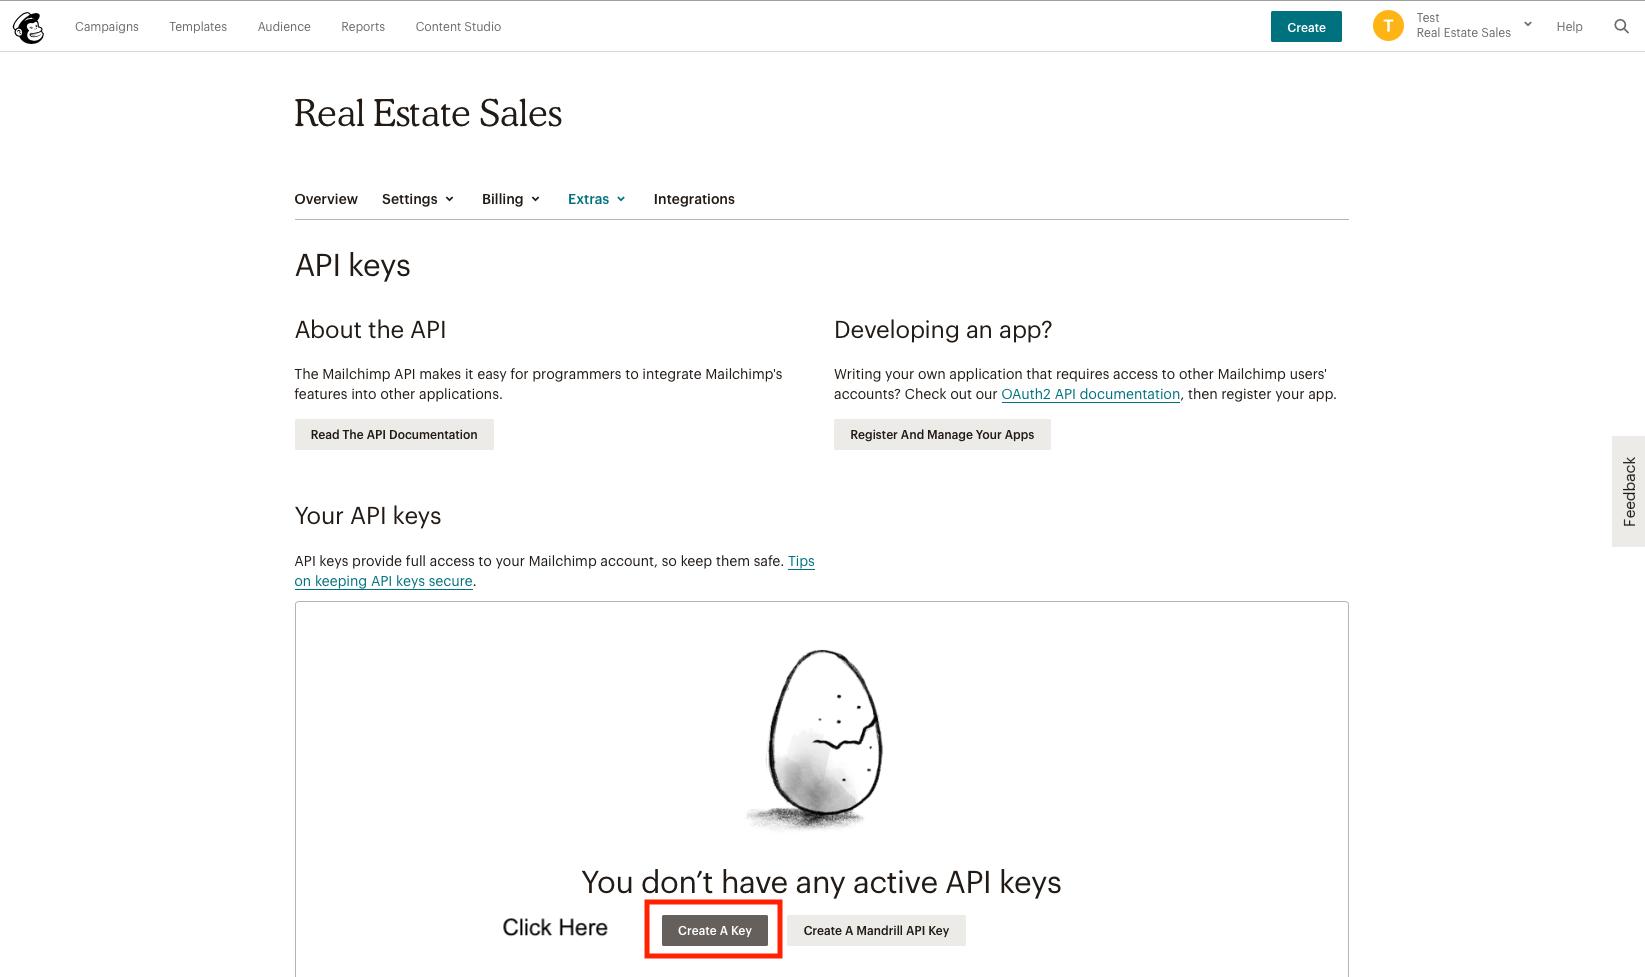 11  Drip Email Marketing — RealOffice360 - Free Real Estate